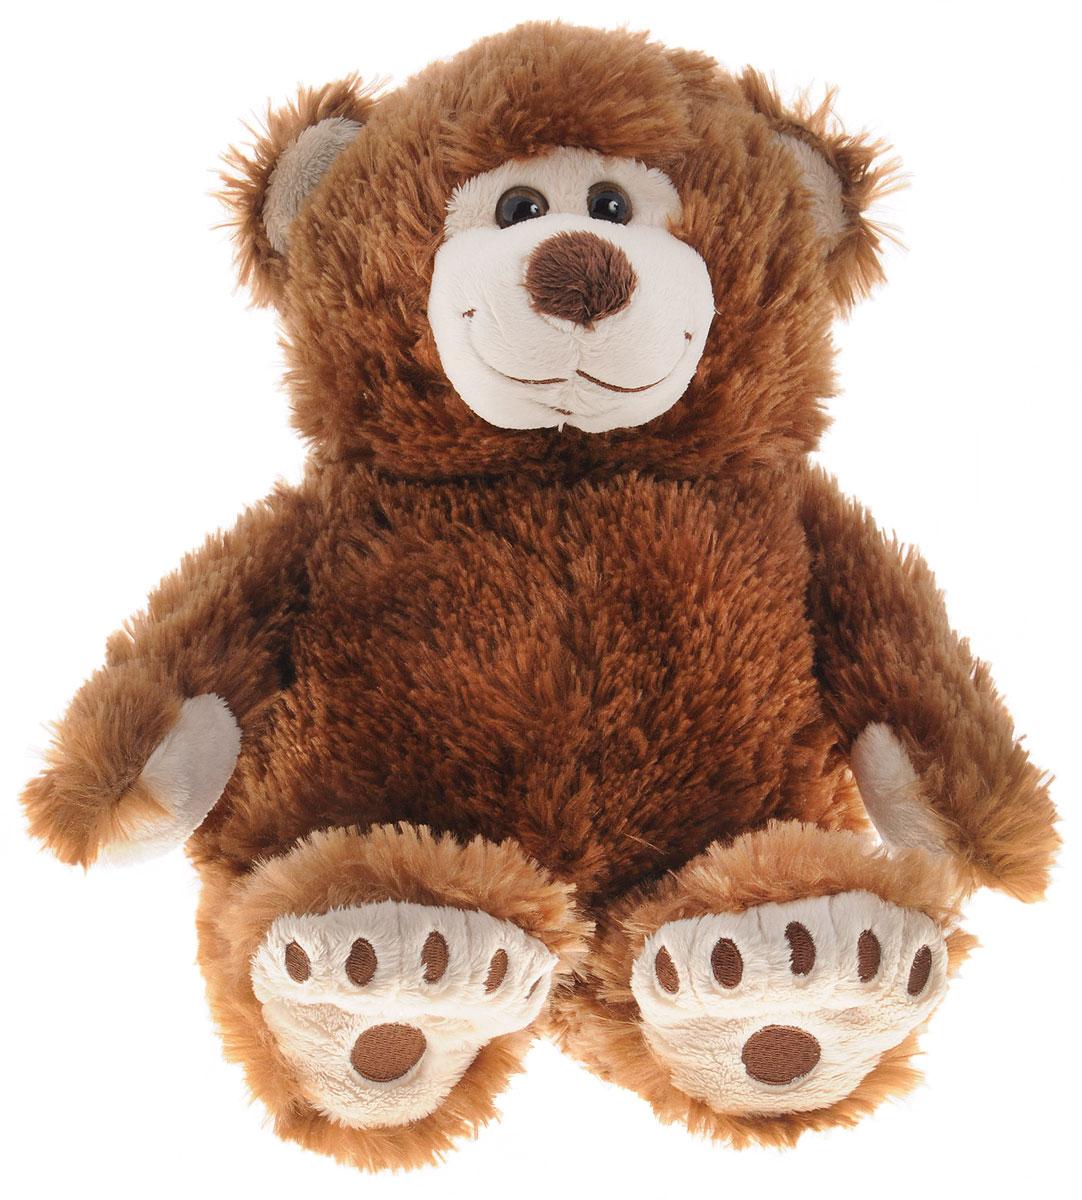 Plush Apple Мягкая игрушка Медведь Аркаша 38 см цвет коричневый кукла kids toys 2015 40 plush toy